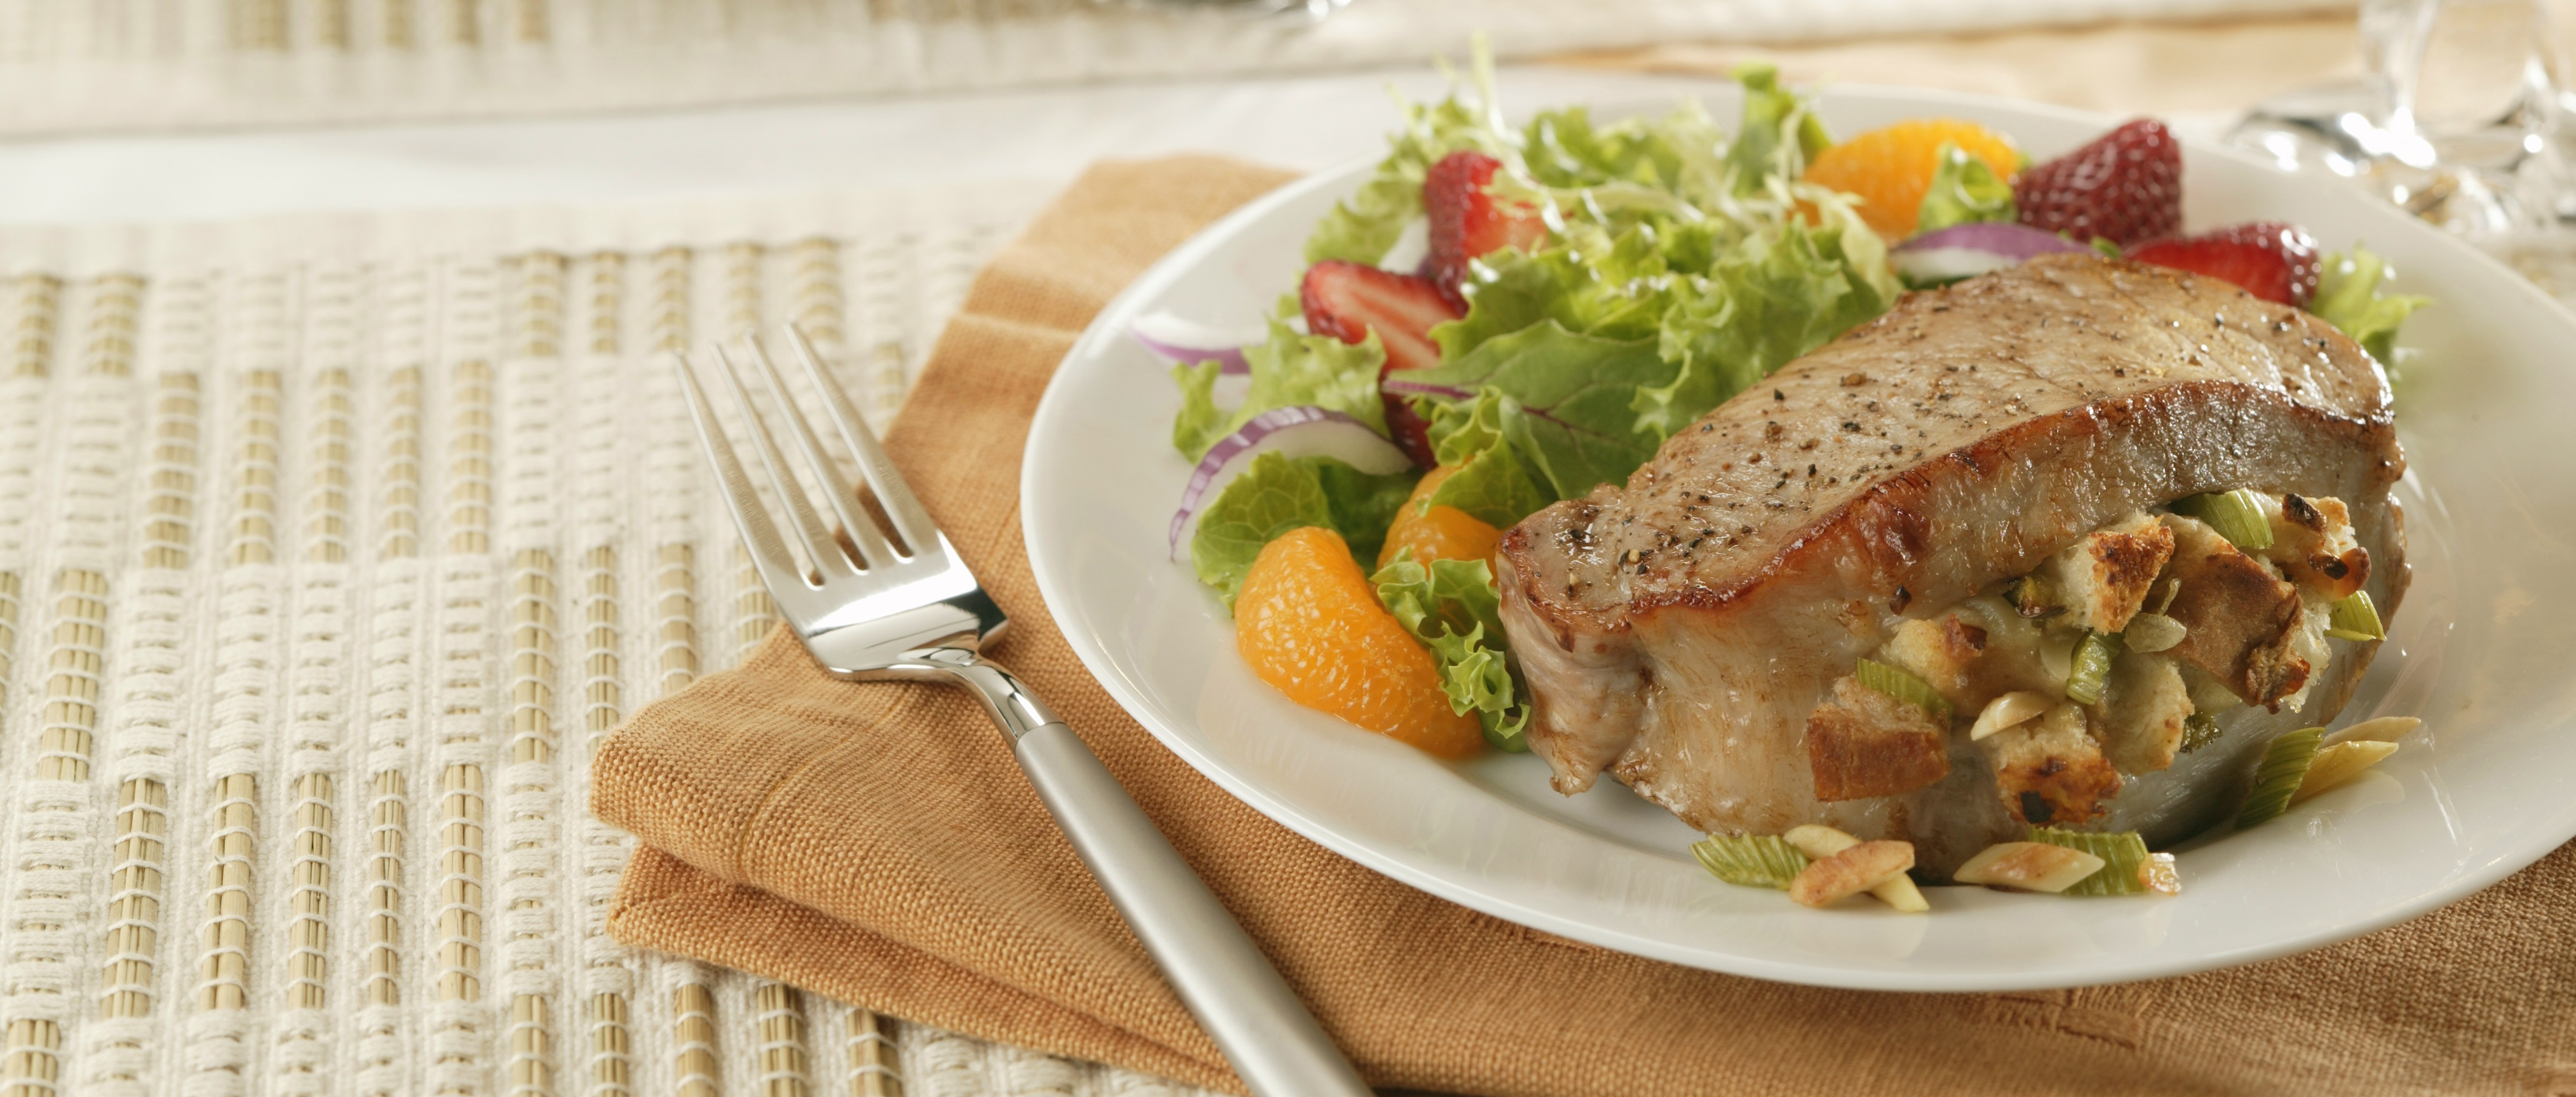 almond_stuffed_pork_chops_hr